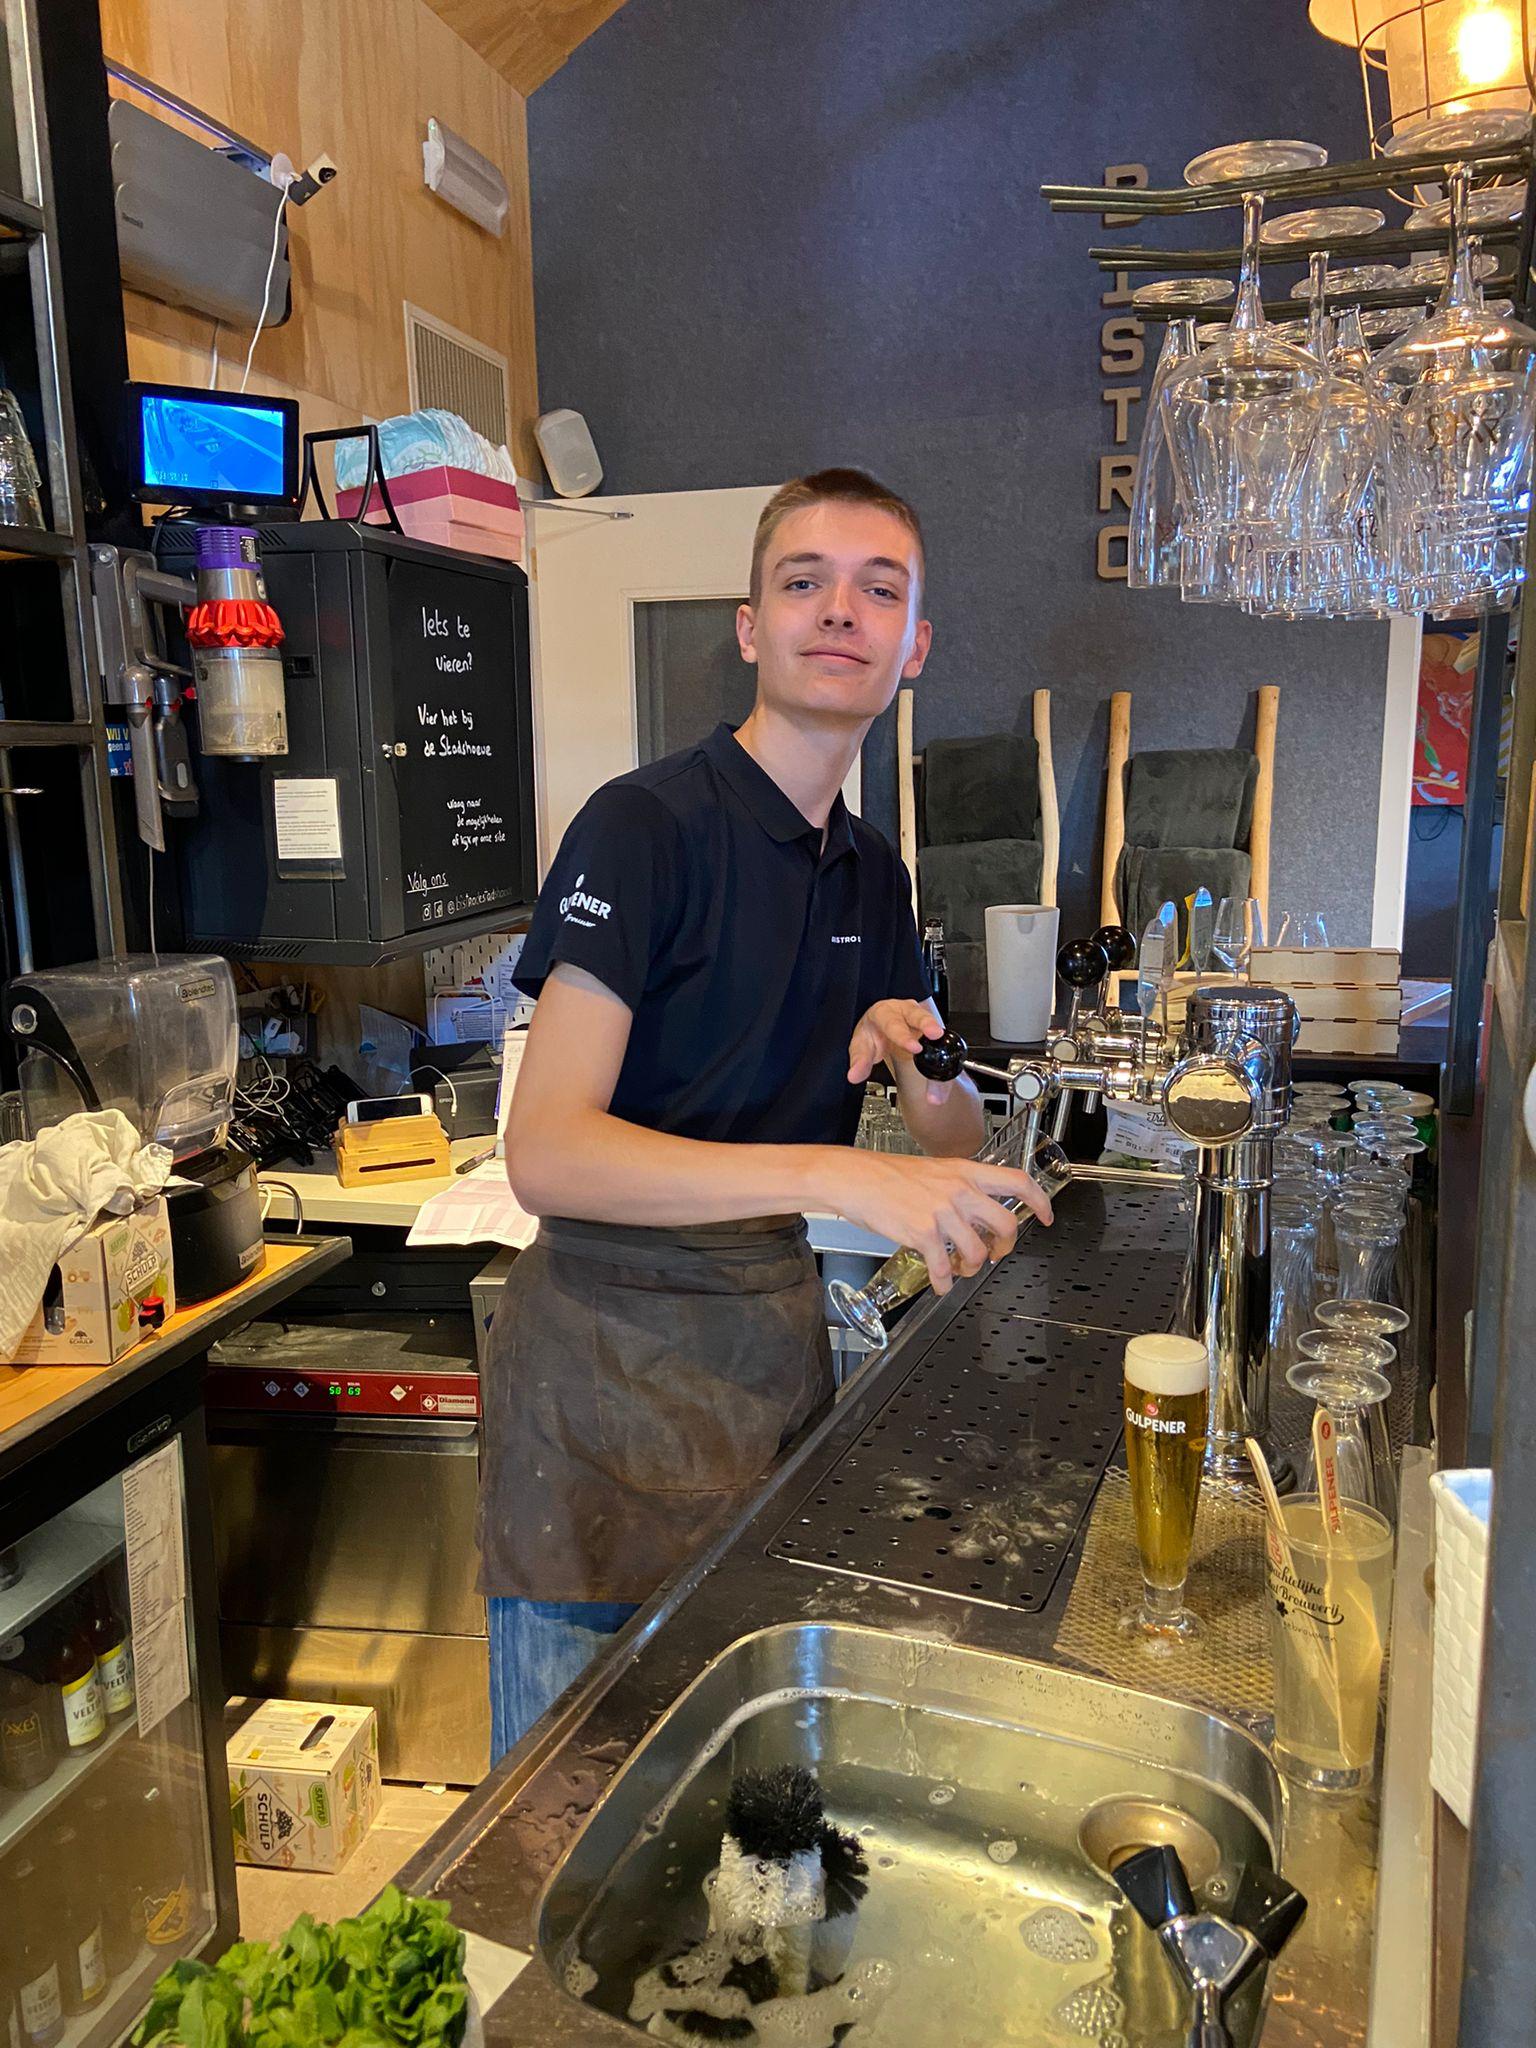 Mike de Barman